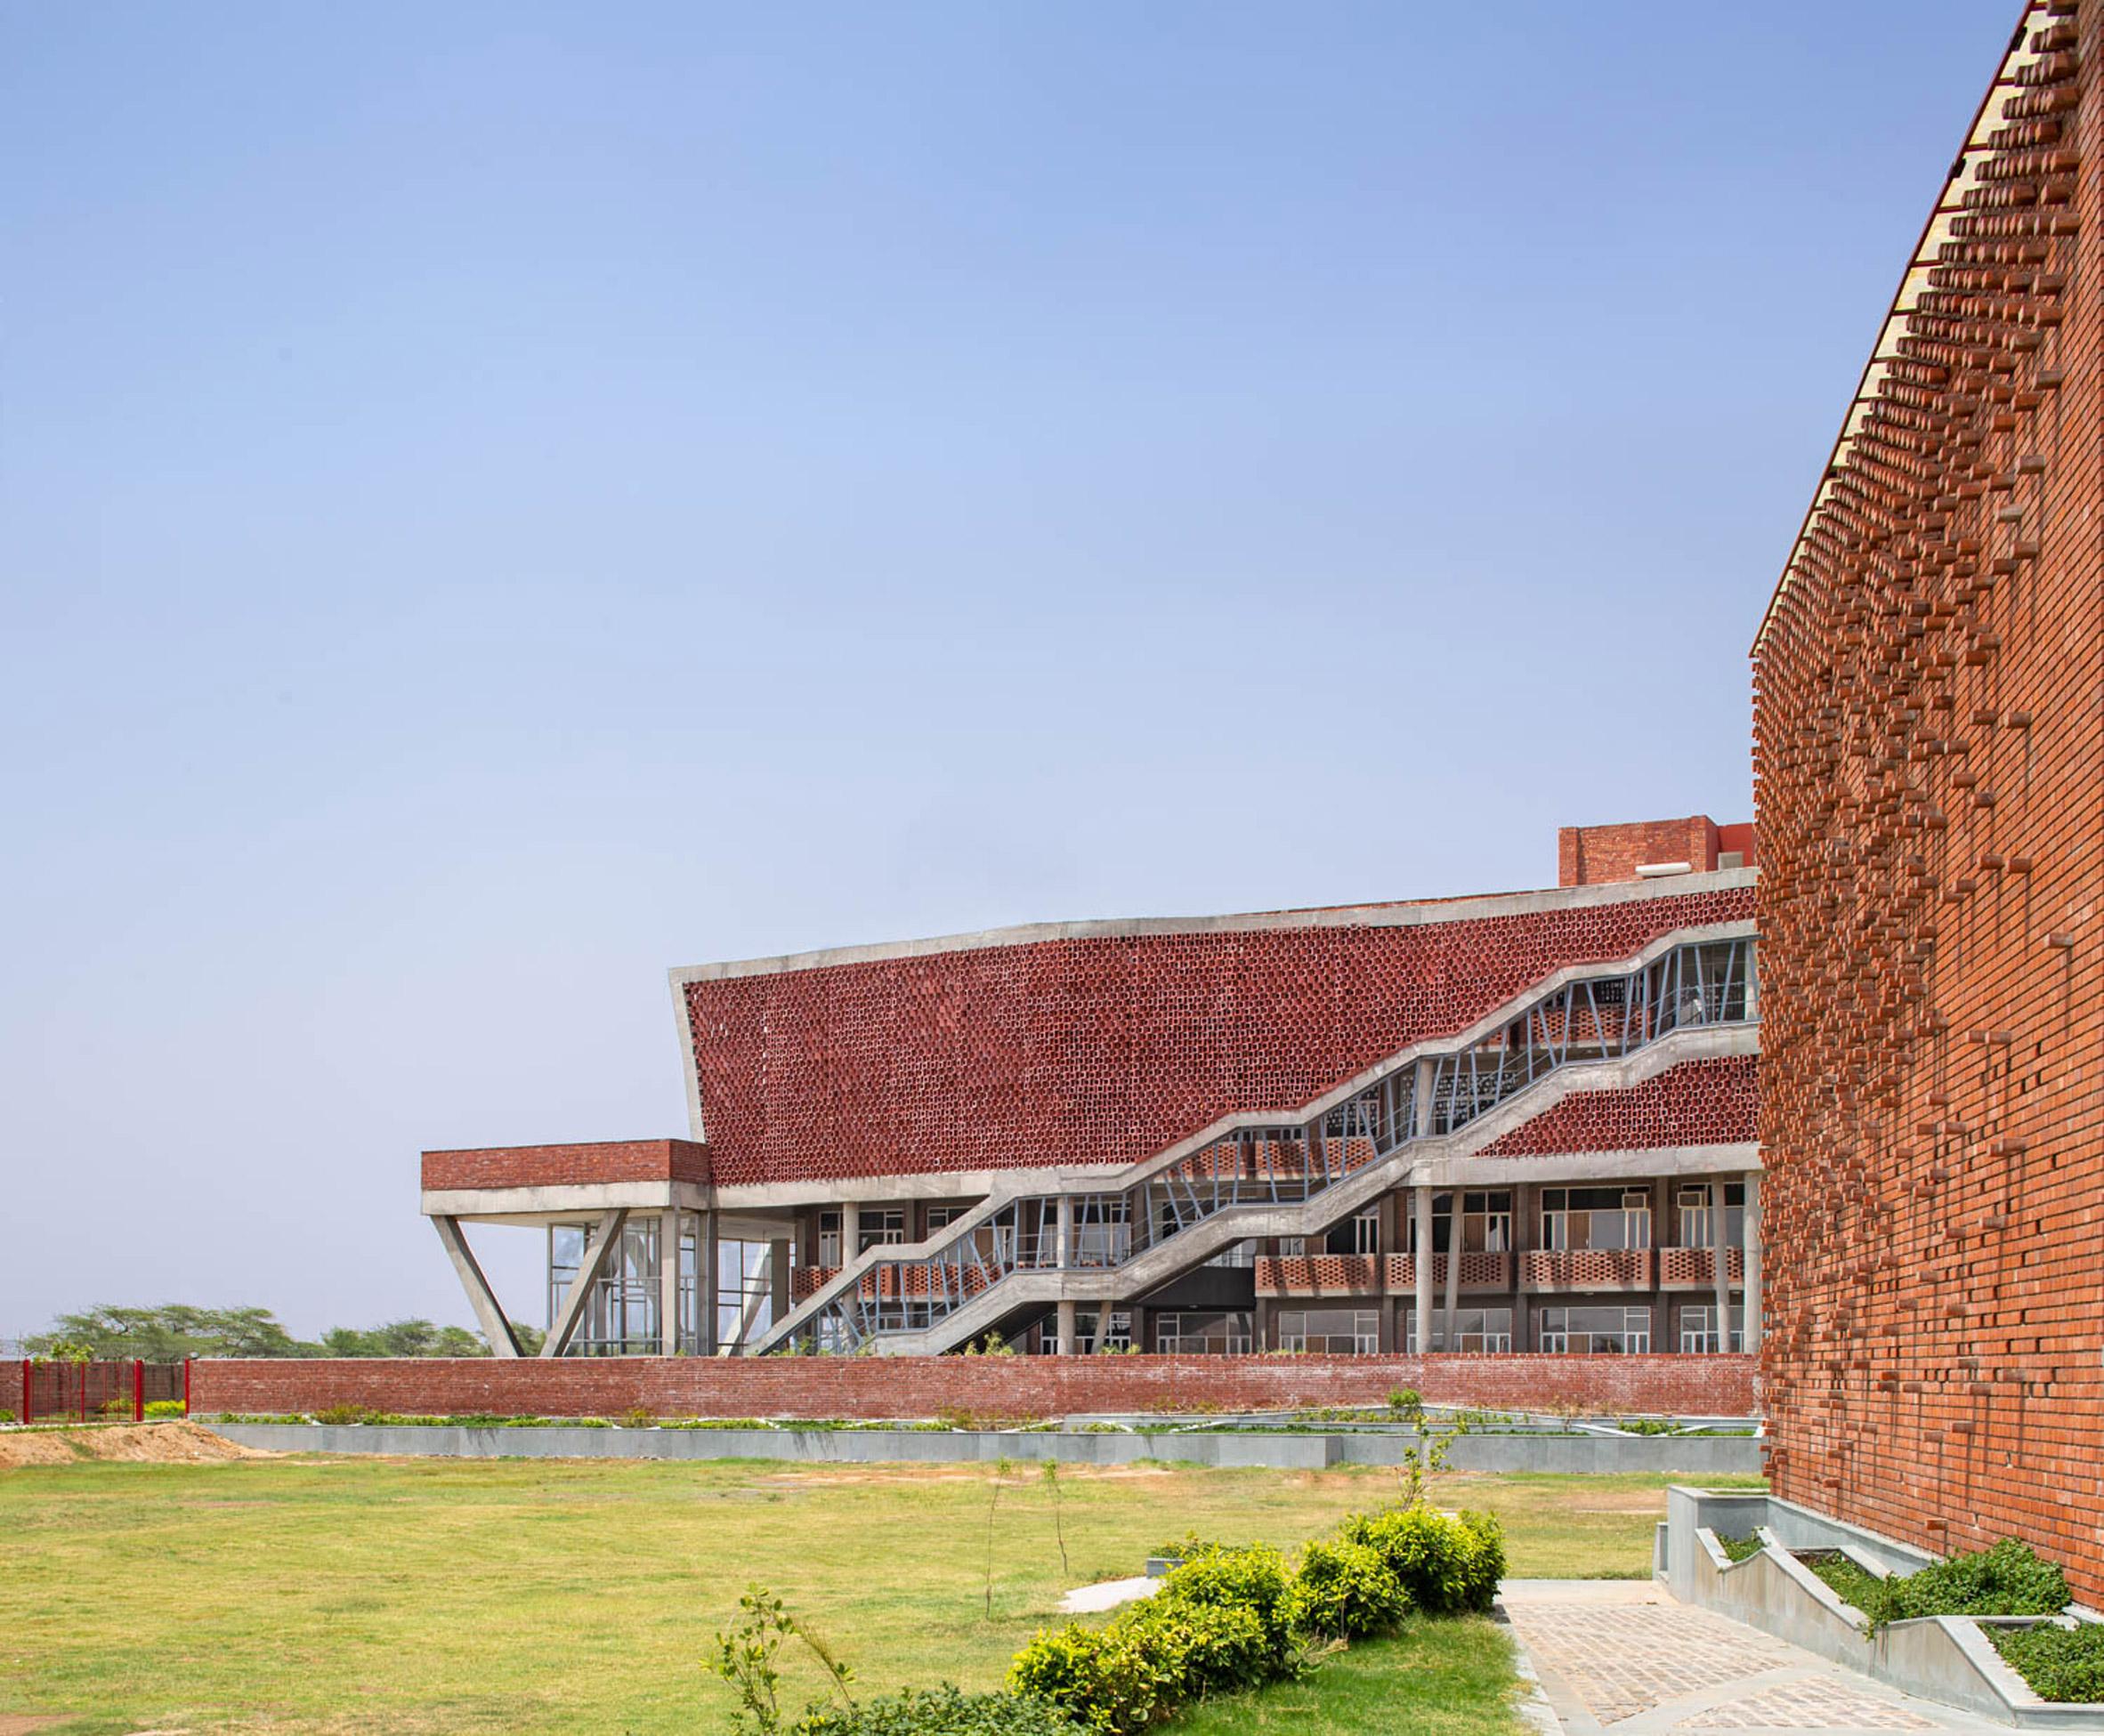 External view of Girls Hostel Block by Zero Energy Design Lab